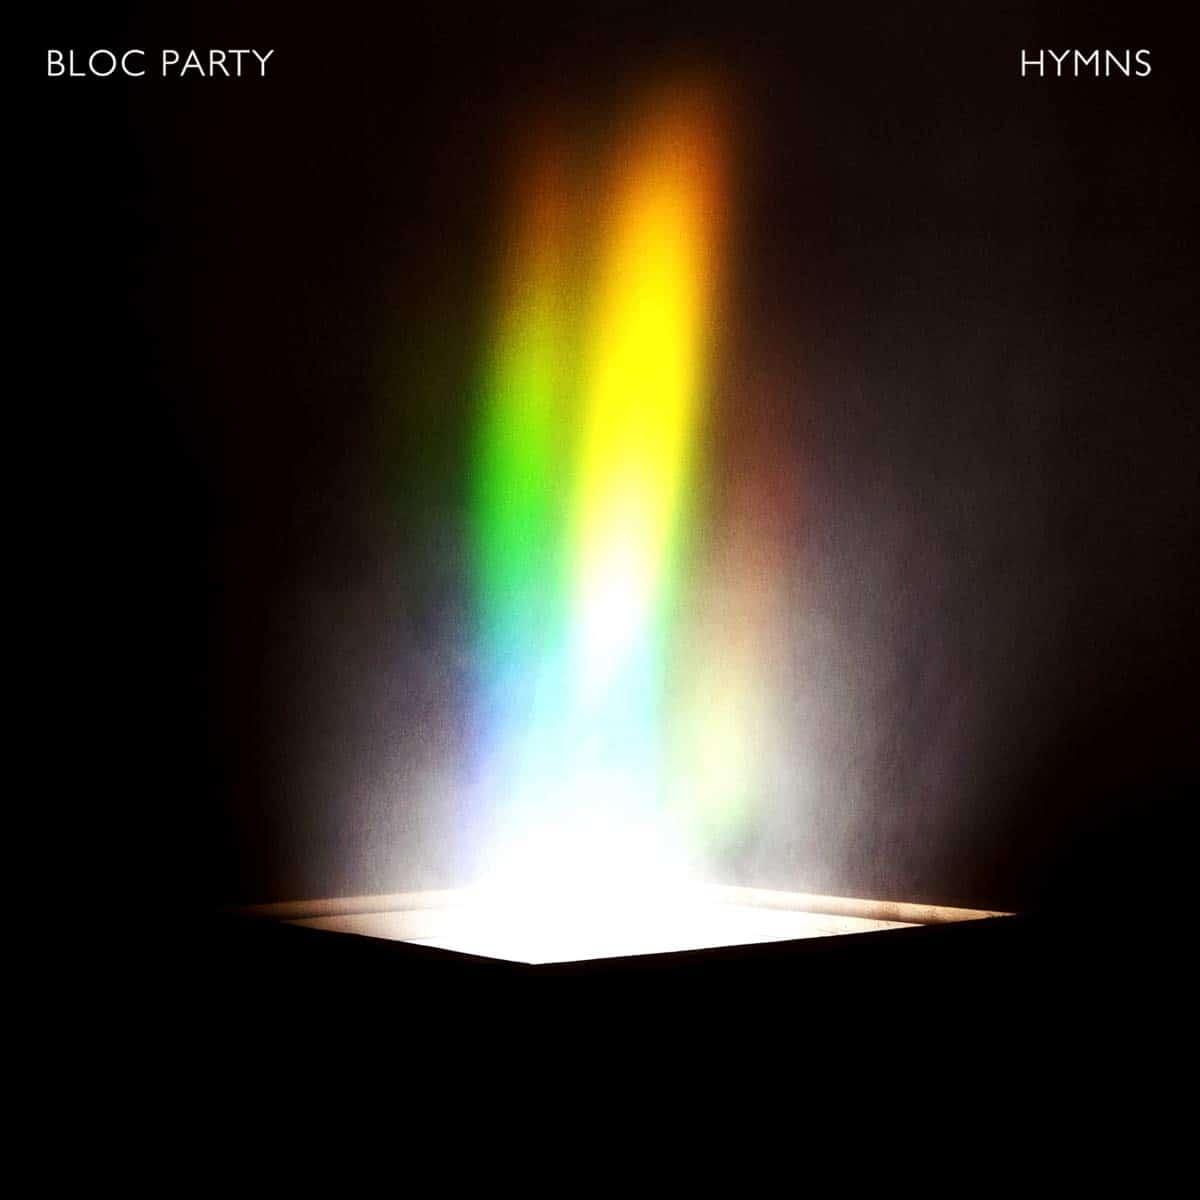 bloc party hymns artwork